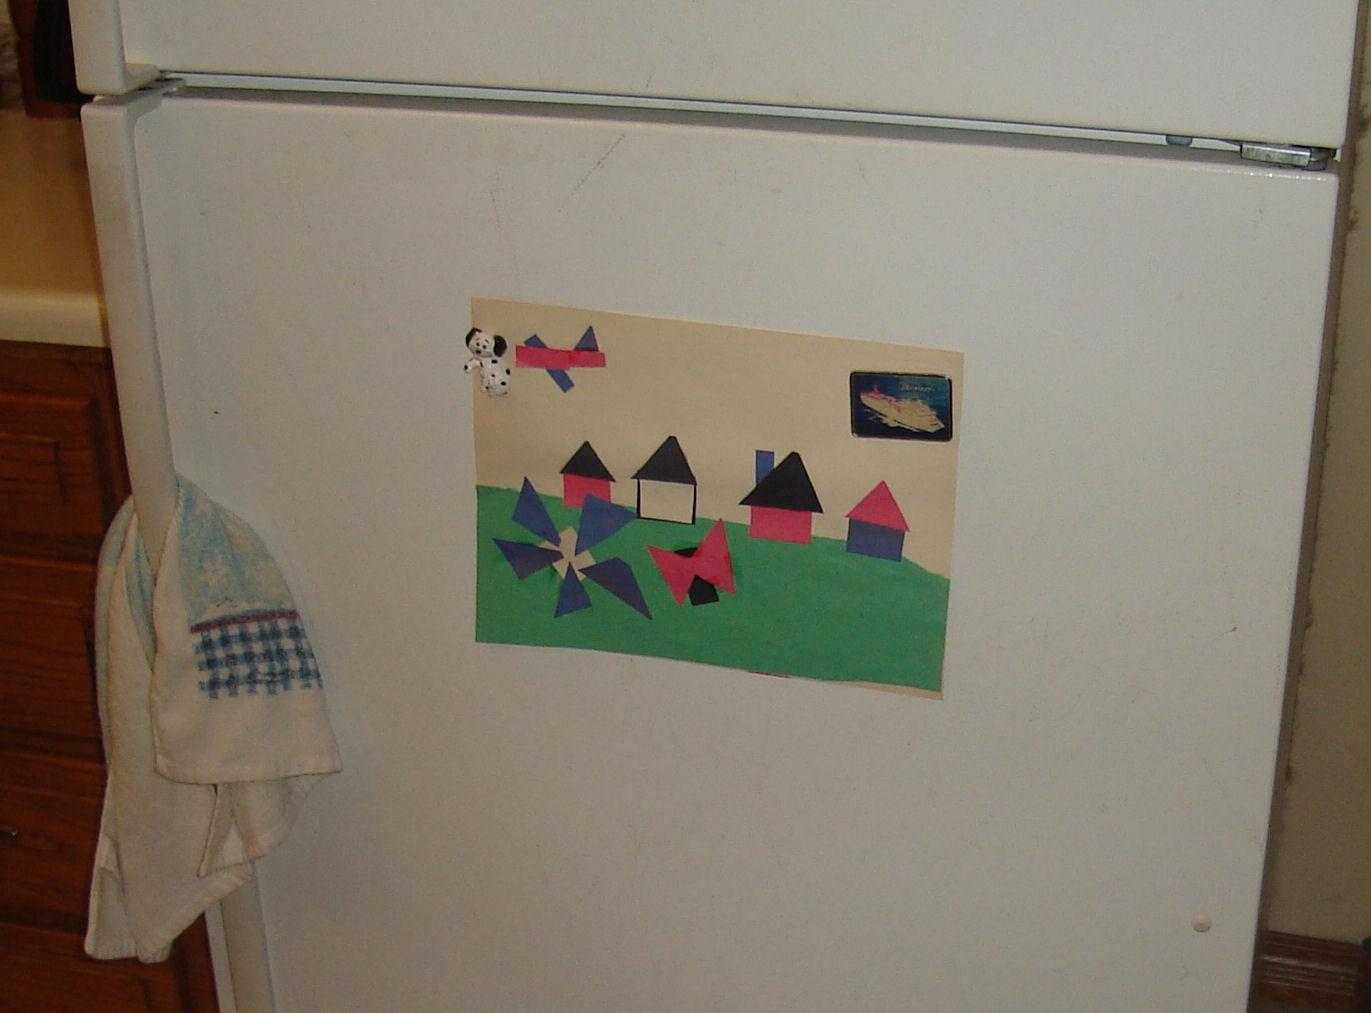 A pastoral landscape in construction paper